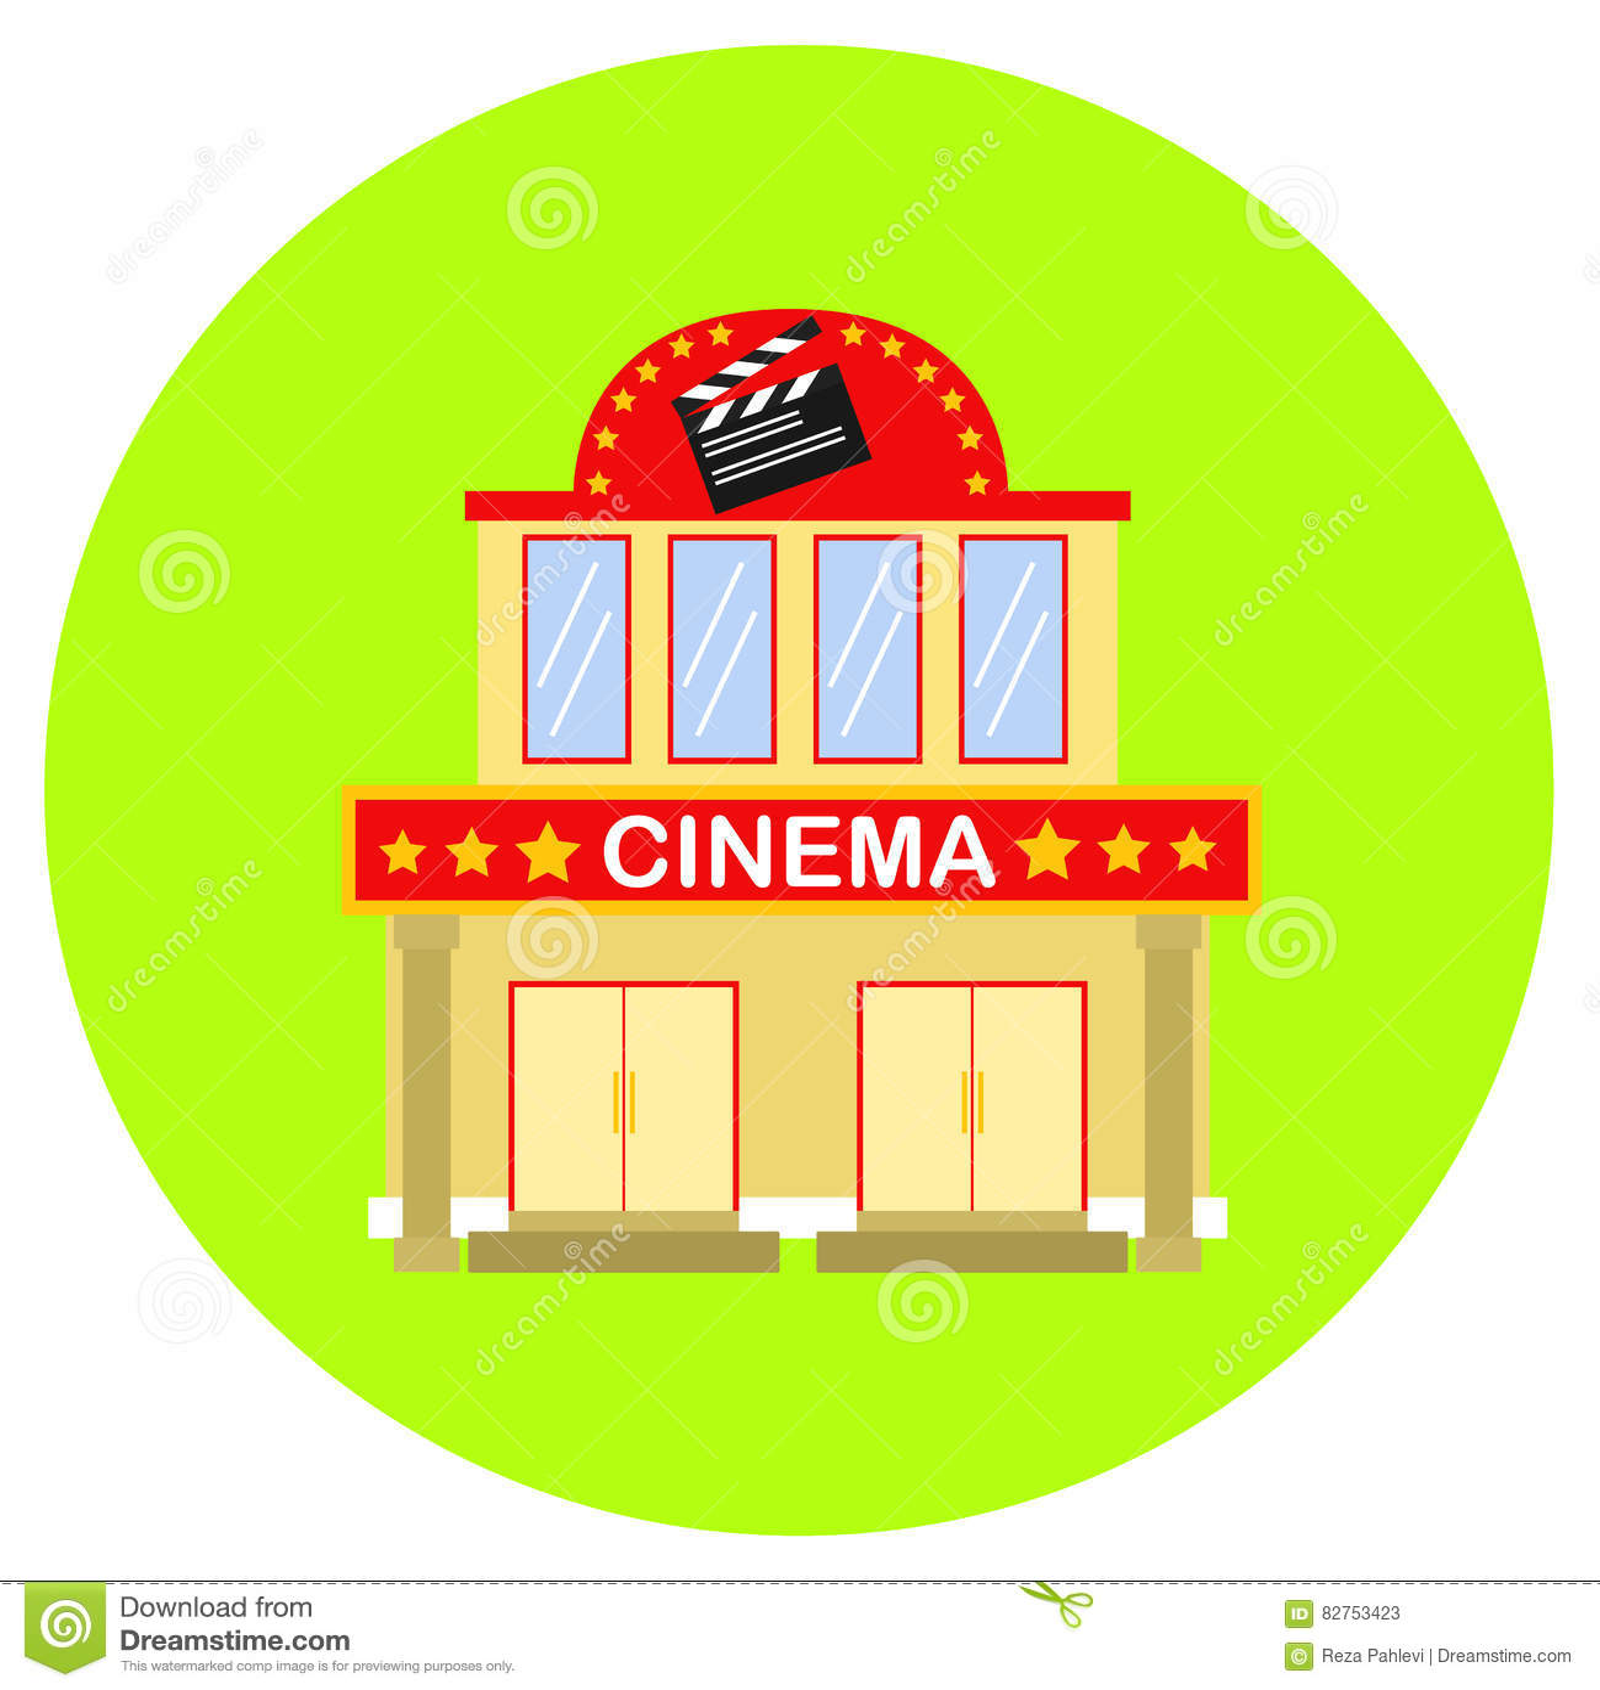 Cinema icon in trendy flat style isolated on grey background cinema icon in trendy flat style isolated on grey background building symbol for your design logo ui vector illustration eps1 biocorpaavc